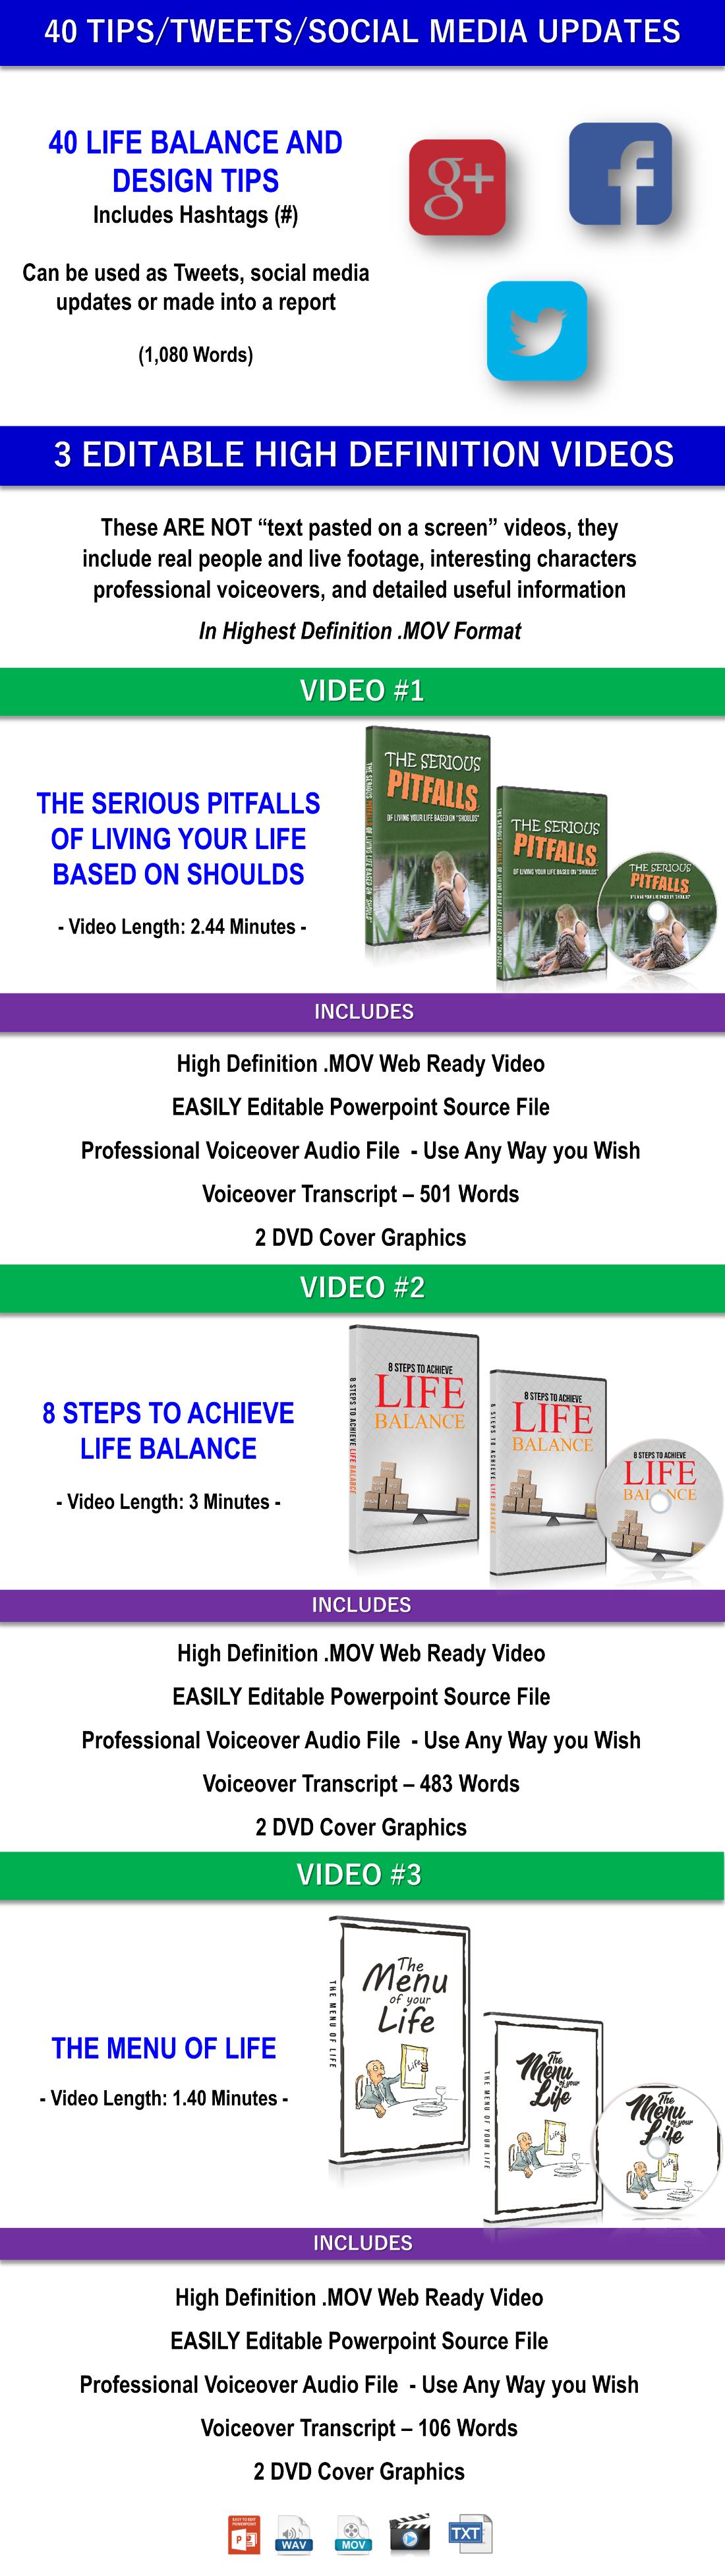 Personal Development/Life Balance PLR